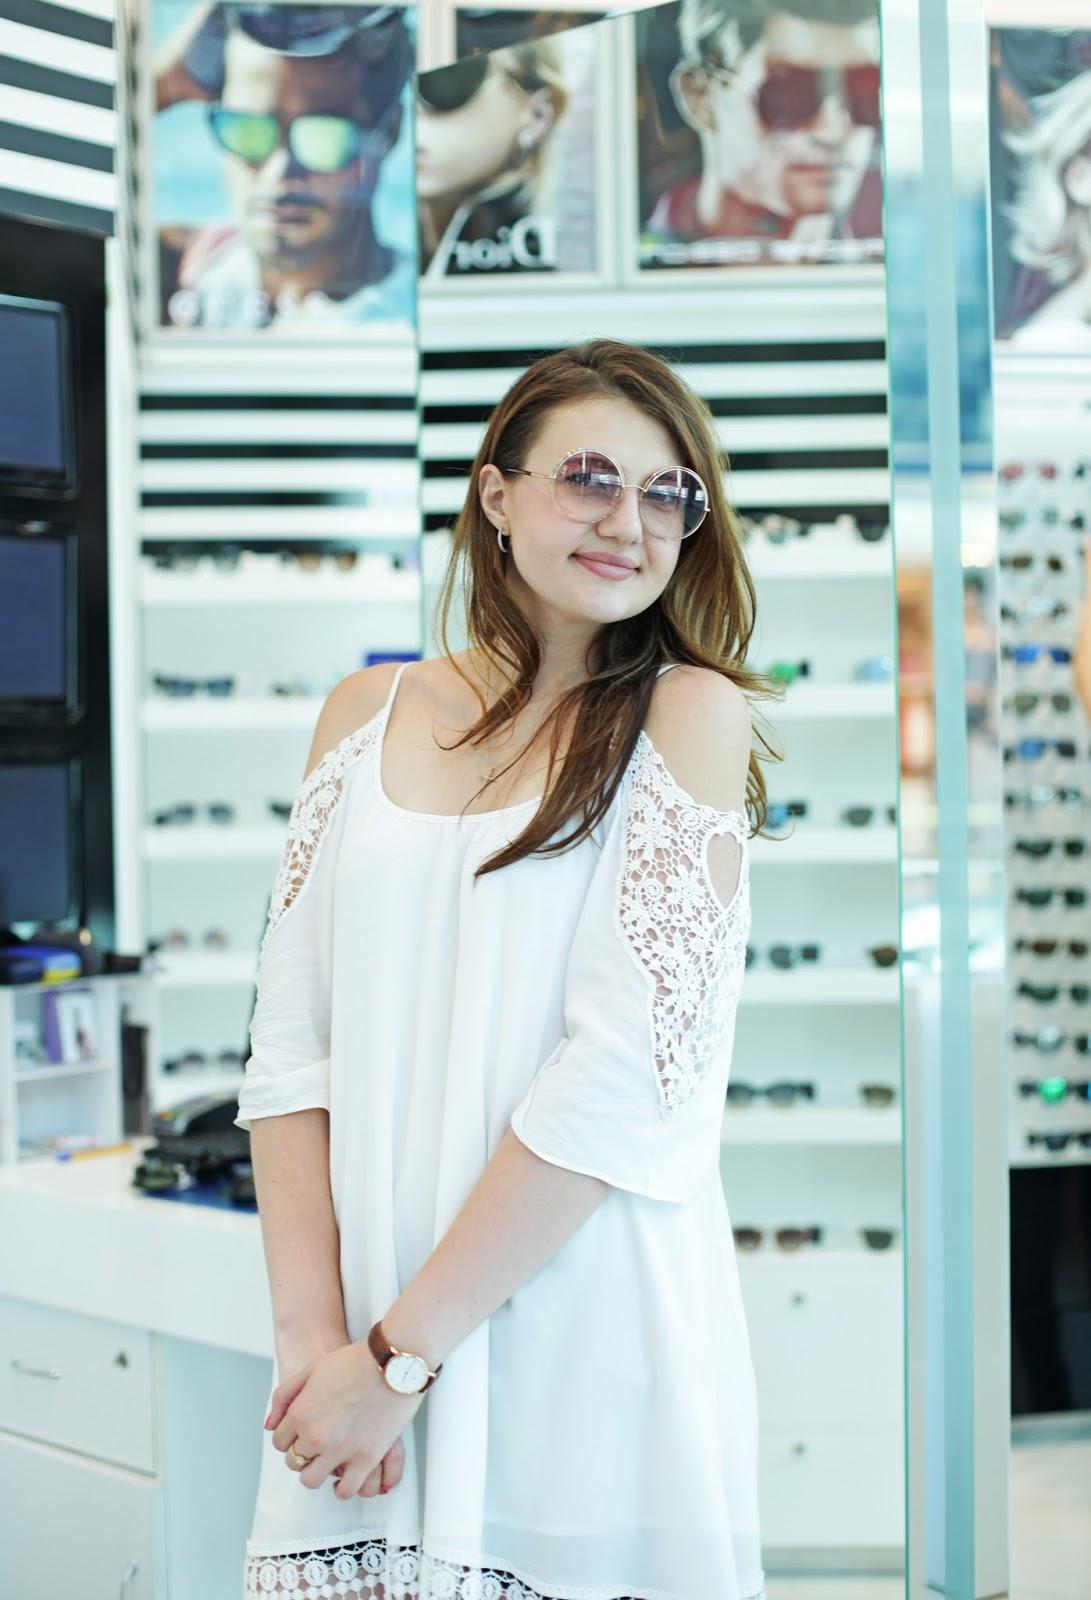 Ocean Plaza, sale, shopping, тренды лета 2016, круглые очки